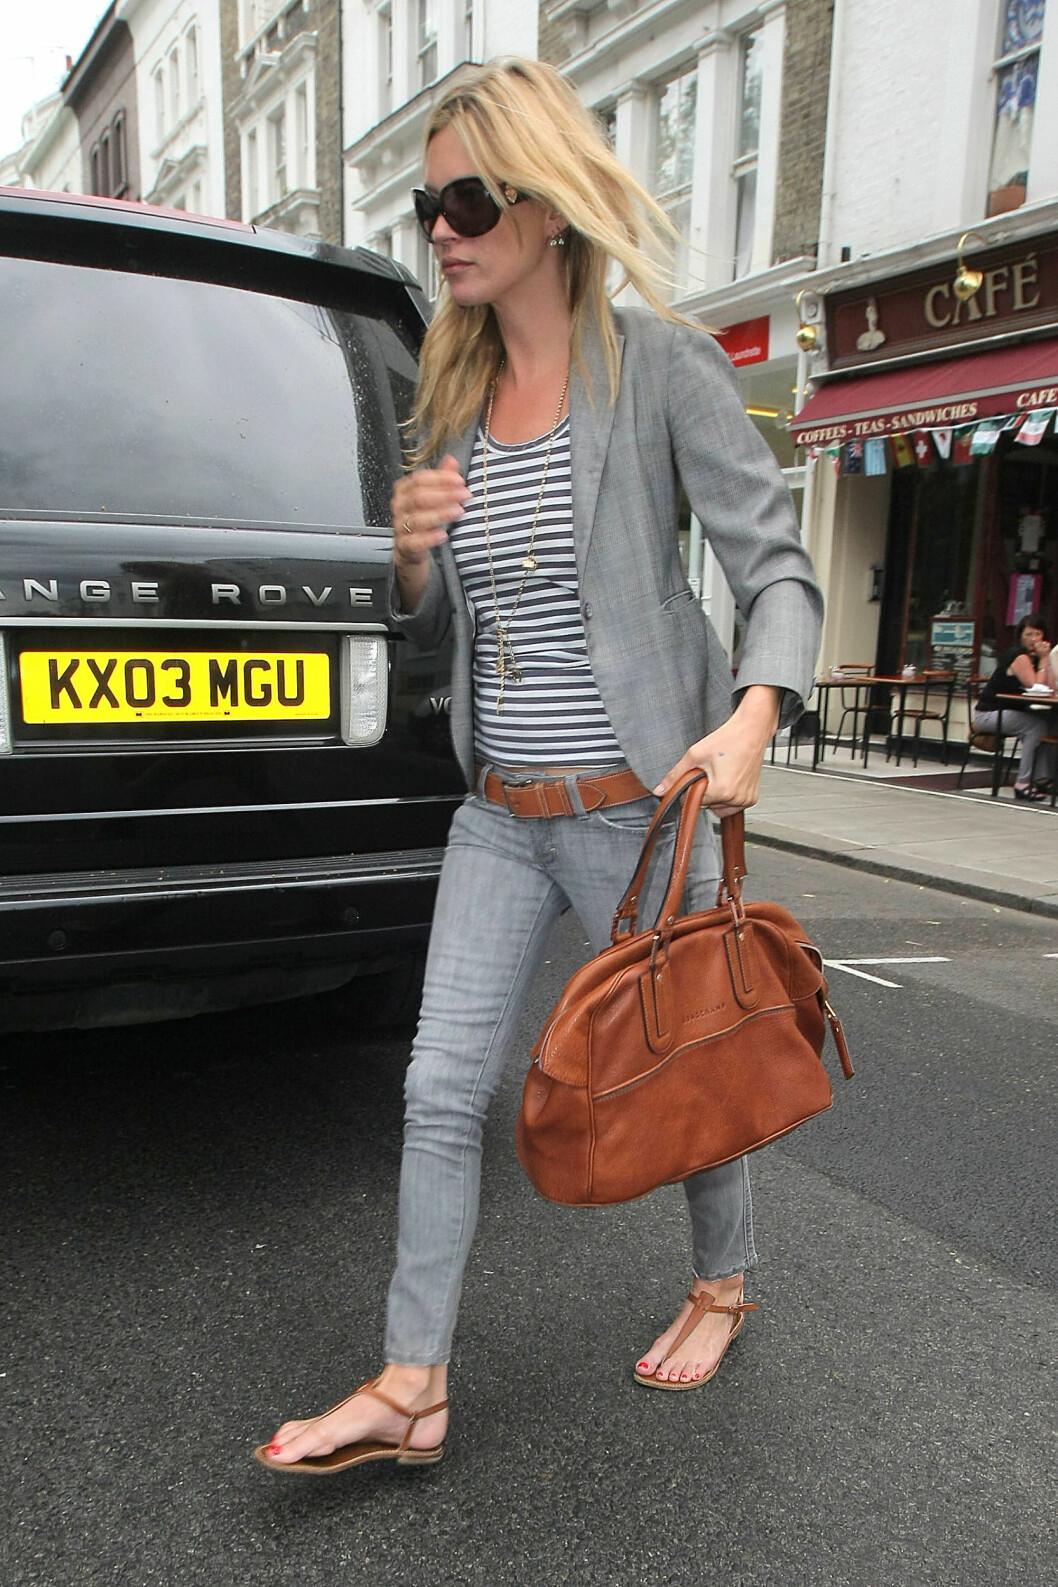 Kate Moss *** Local Caption *** 10.1204191a Foto: REX/Martin Karius/All Over Press